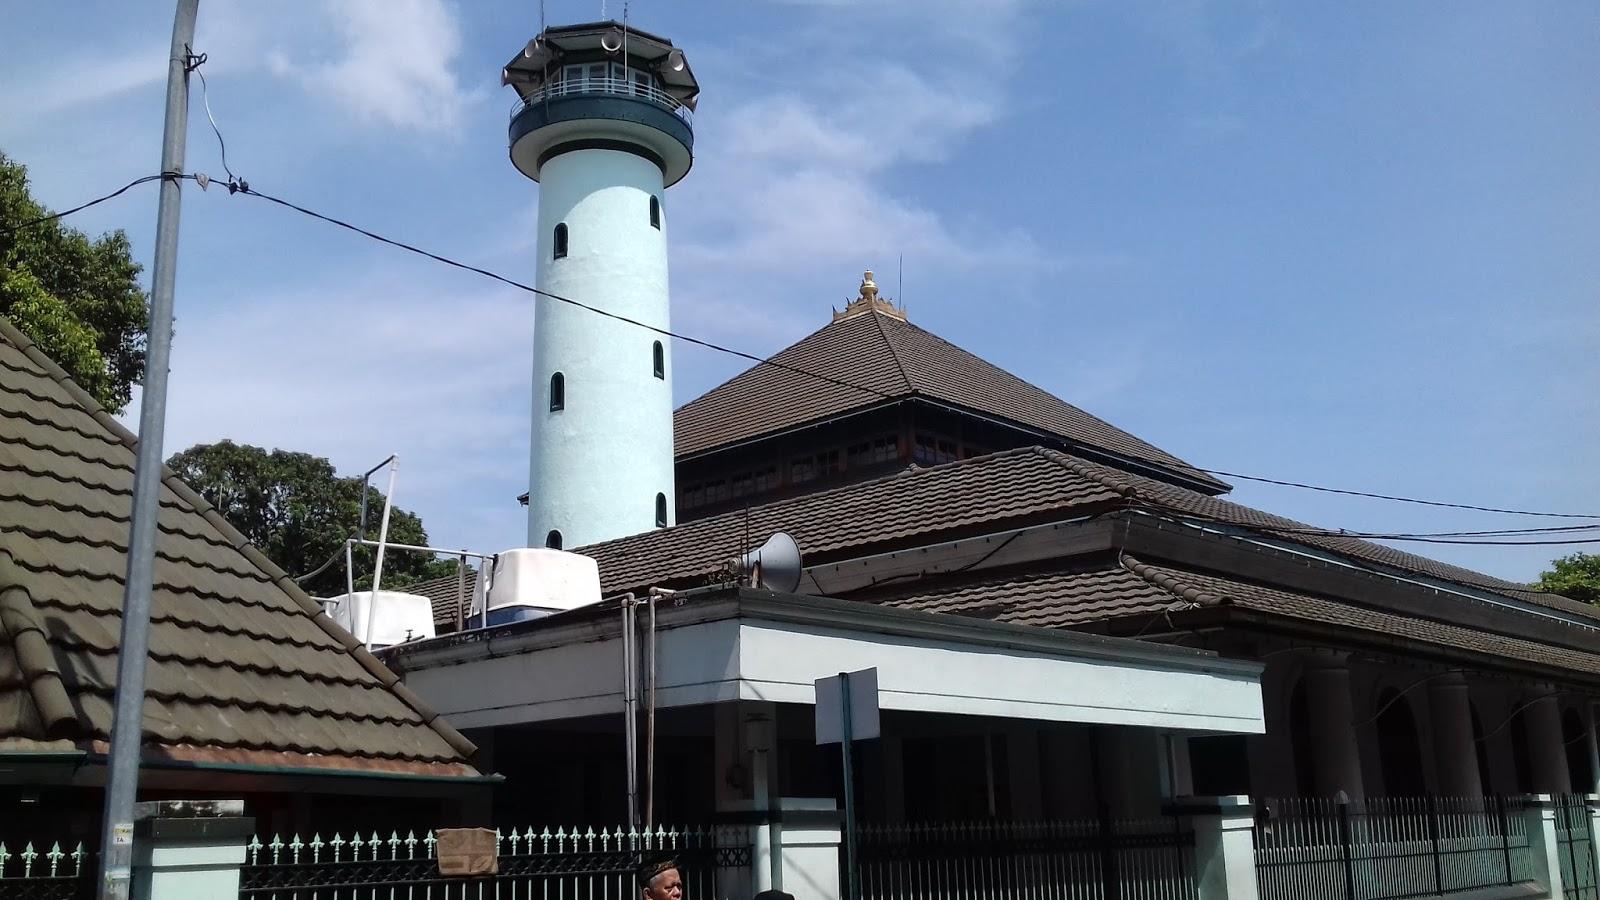 596 Usia Masjid Sunan Ampel Surabaya Bunda Tri Kota